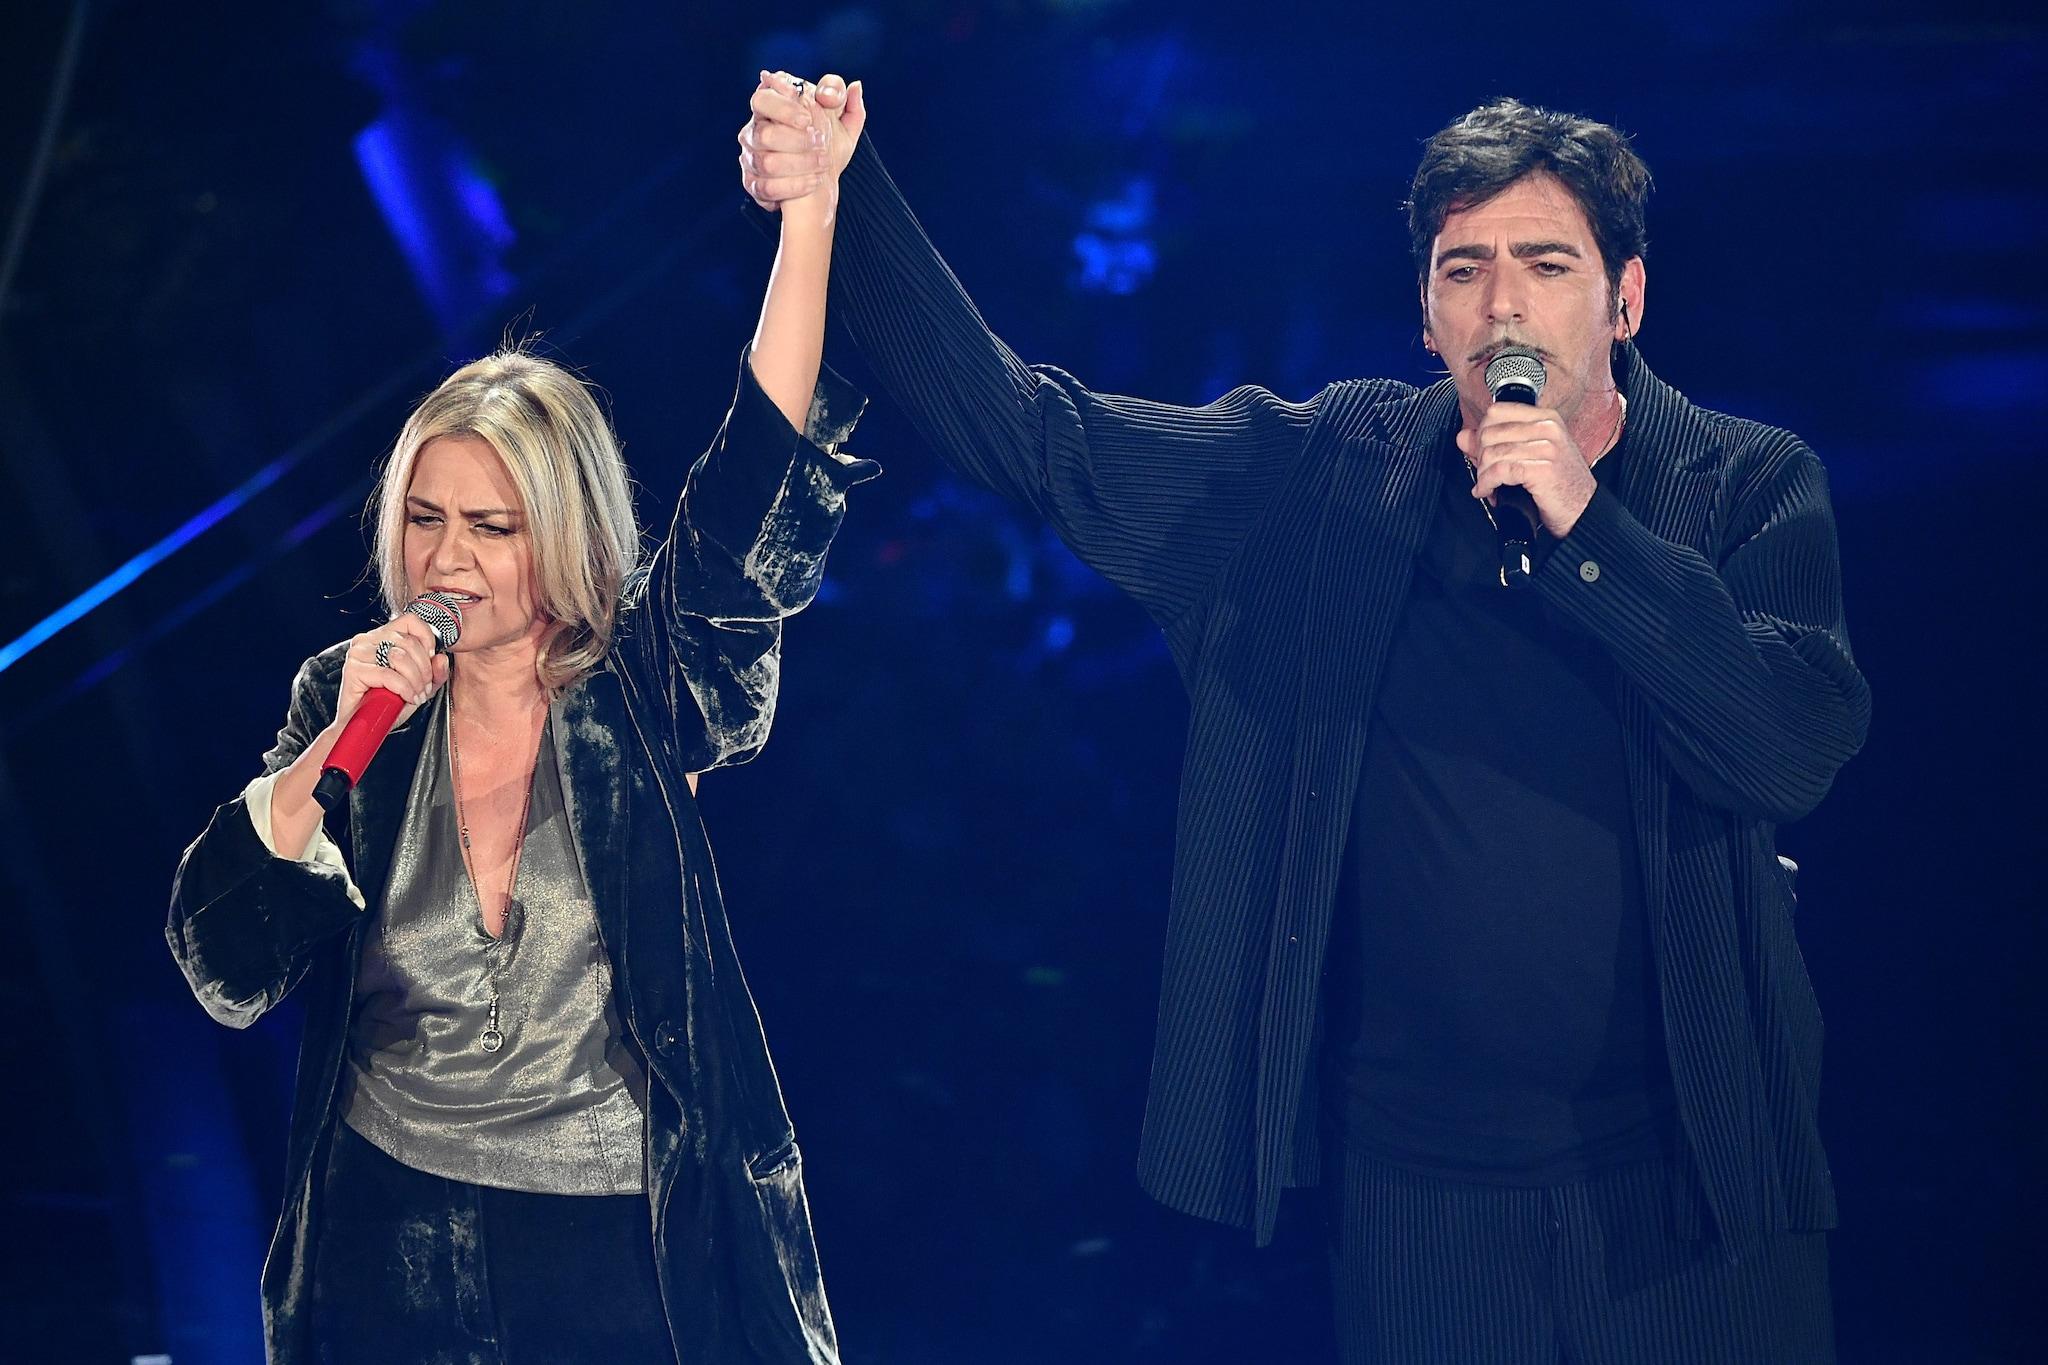 Irene Grandi e Bobo Rondelli (Lapresse)